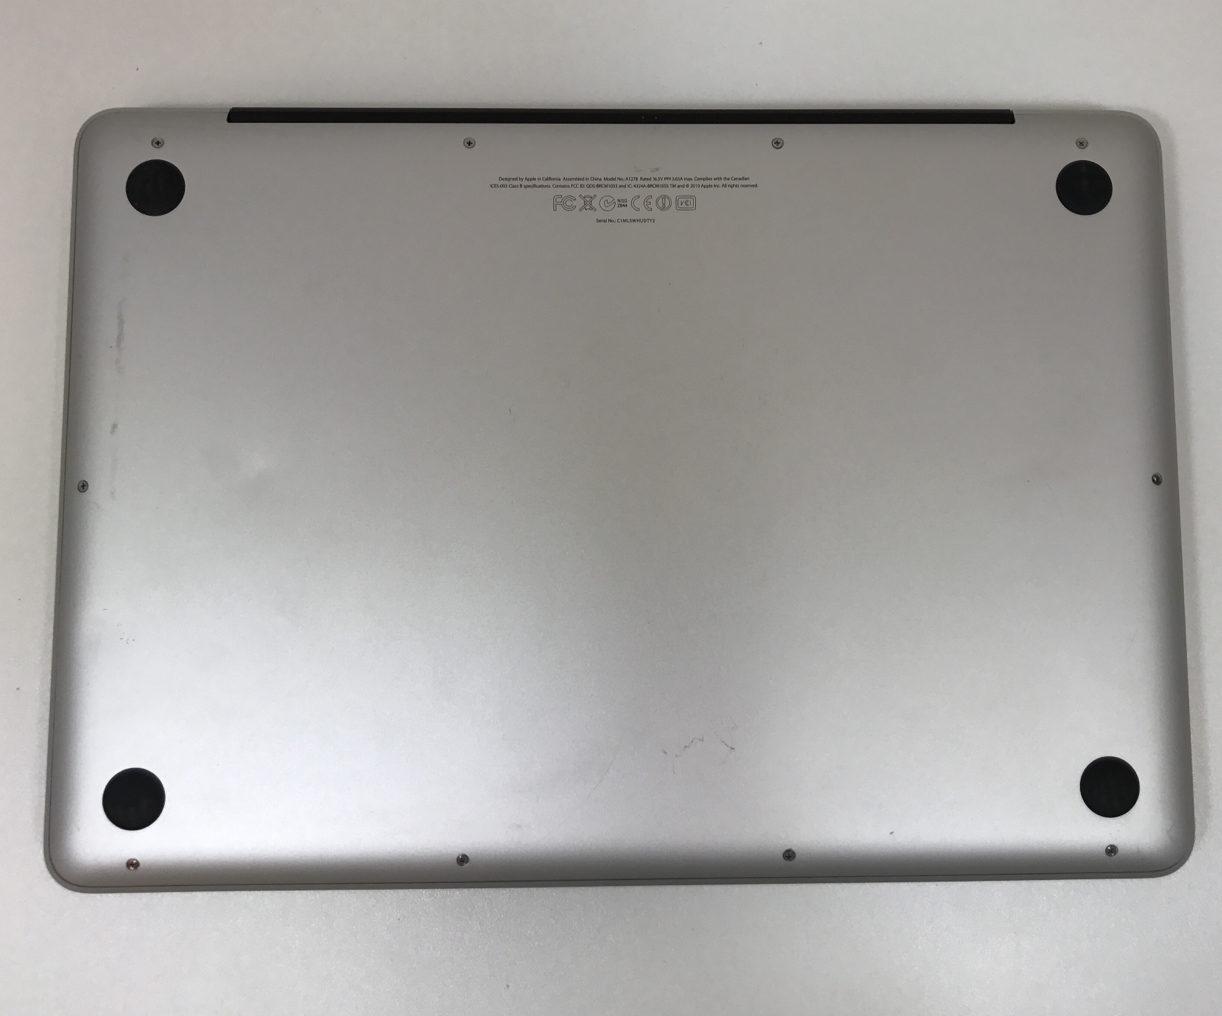 MacBook Pro 13-inch, 2.5GHz Intel Dual-Core i5, 4GB, 500GB HDD, Afbeelding 3